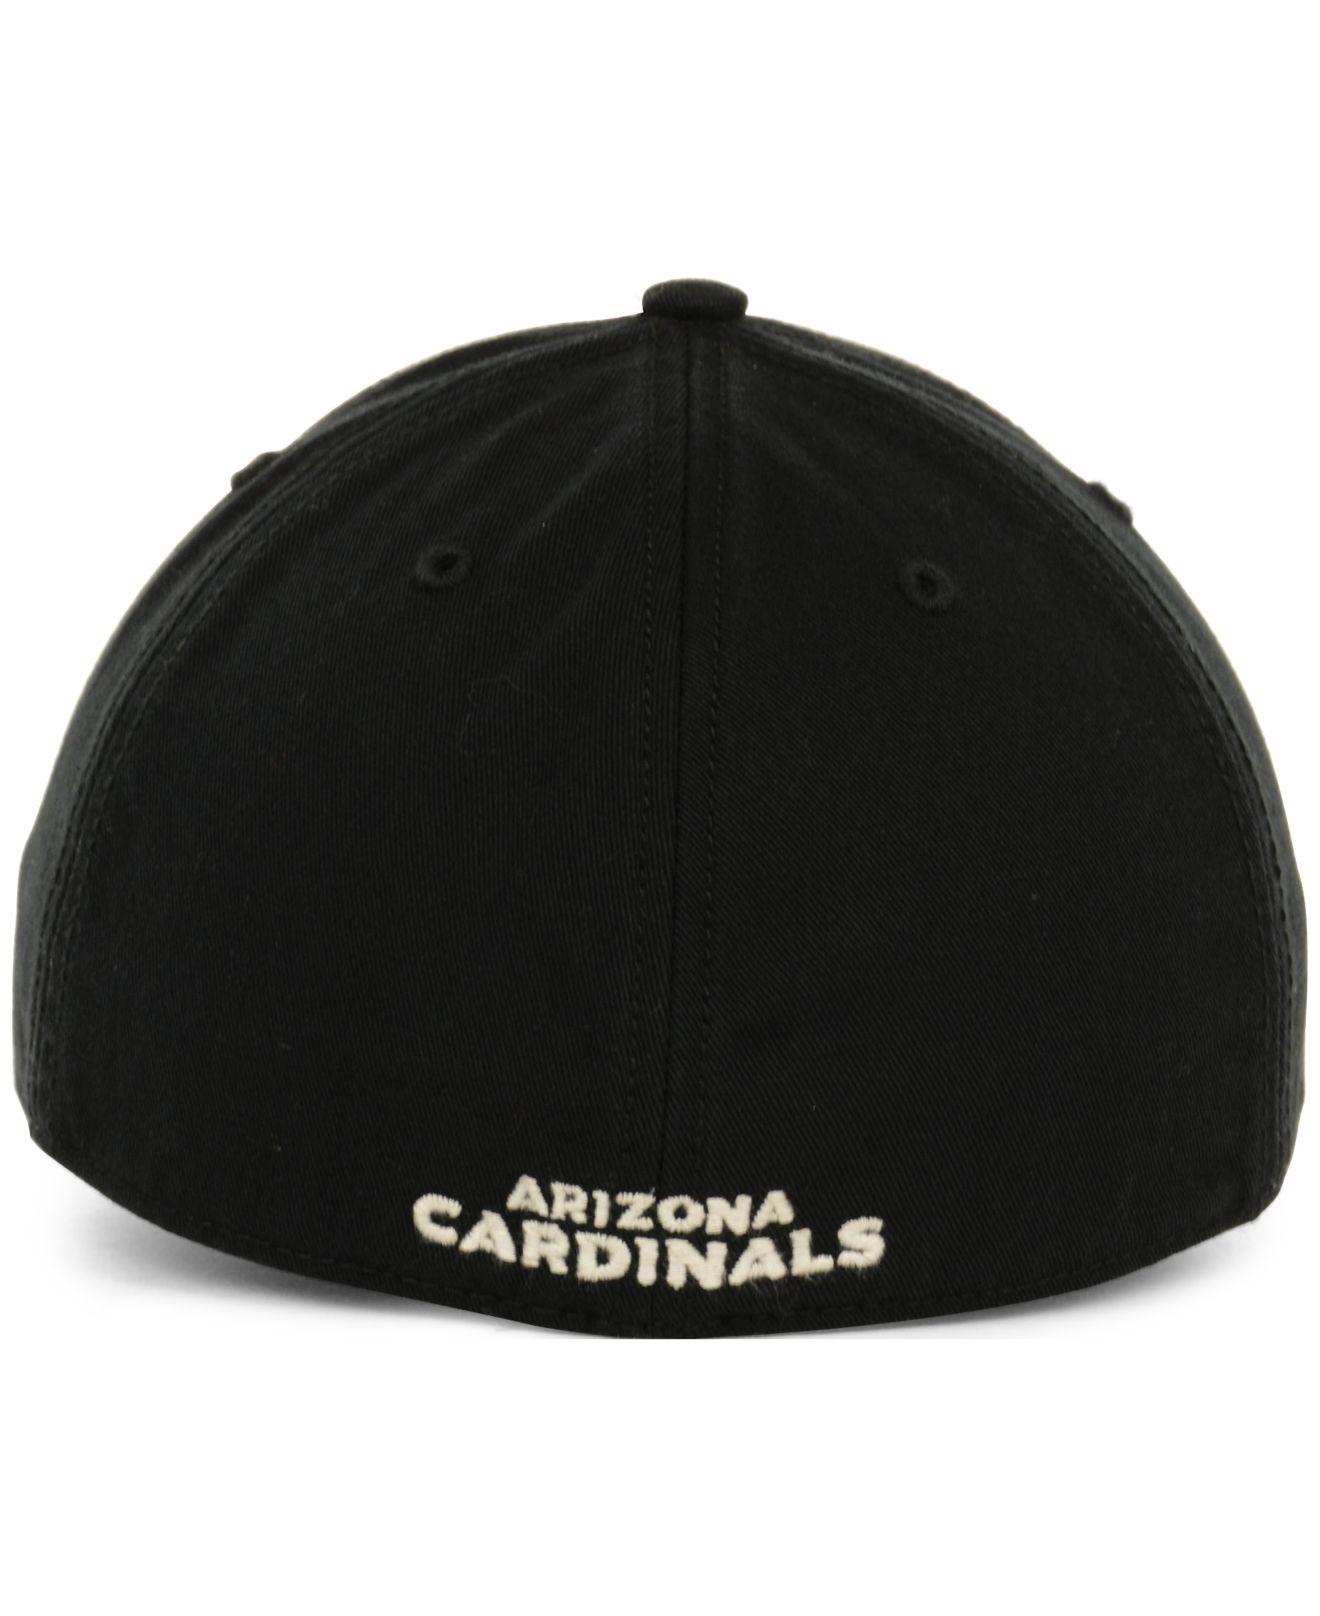 93c6016d8 Lyst - 47 Brand Arizona Cardinals Franchise Hat in Black for Men